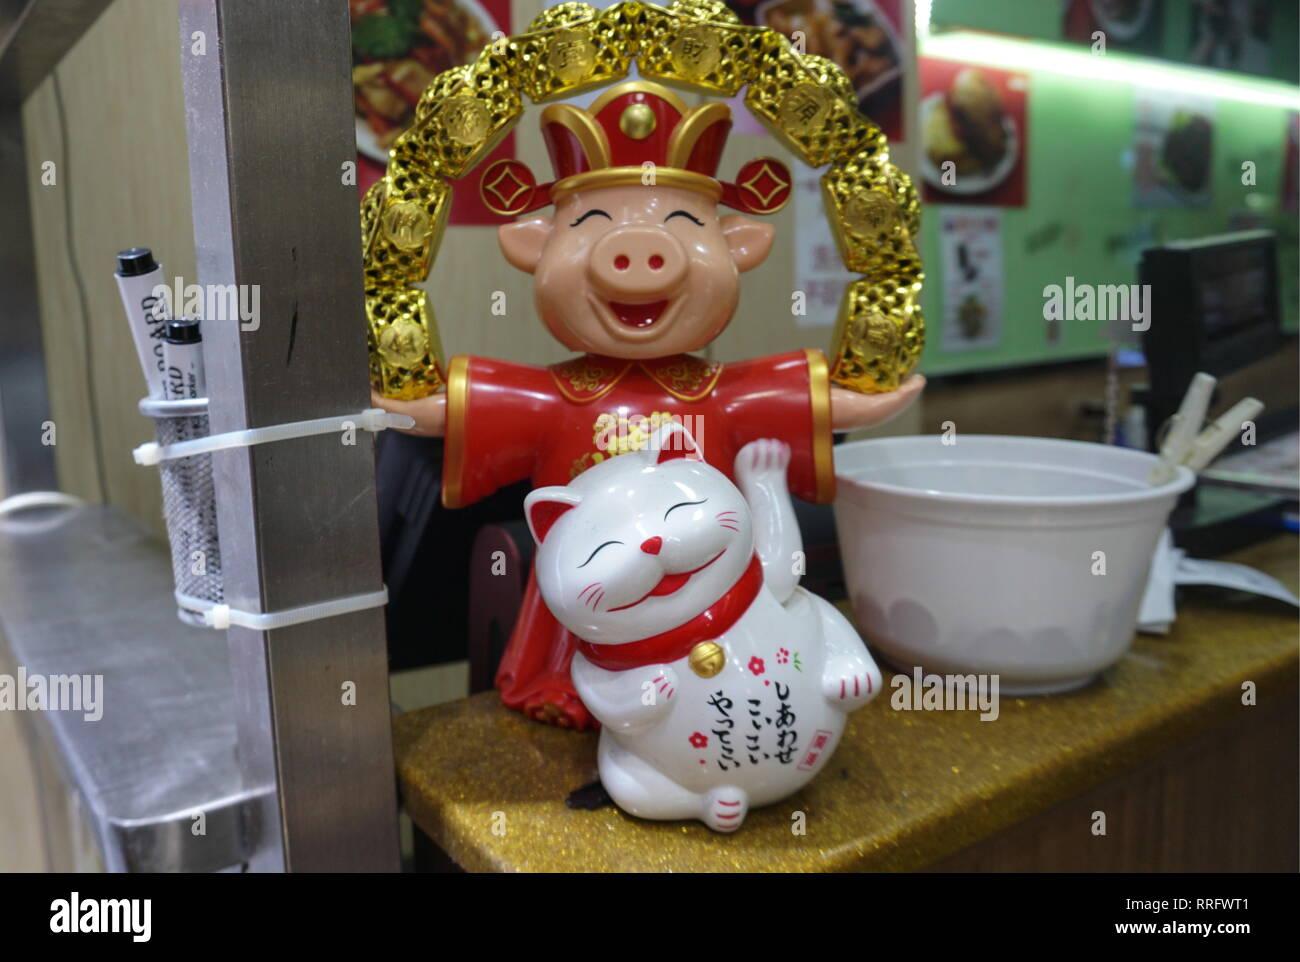 HONG KONG, CHINA - FEBRUARY 26, 2019: A street food stall in the Hong Kong Special Administrative Region (HKSAR) of the People's Republic of China. Alexander Shcherbak/TASS - Stock Image